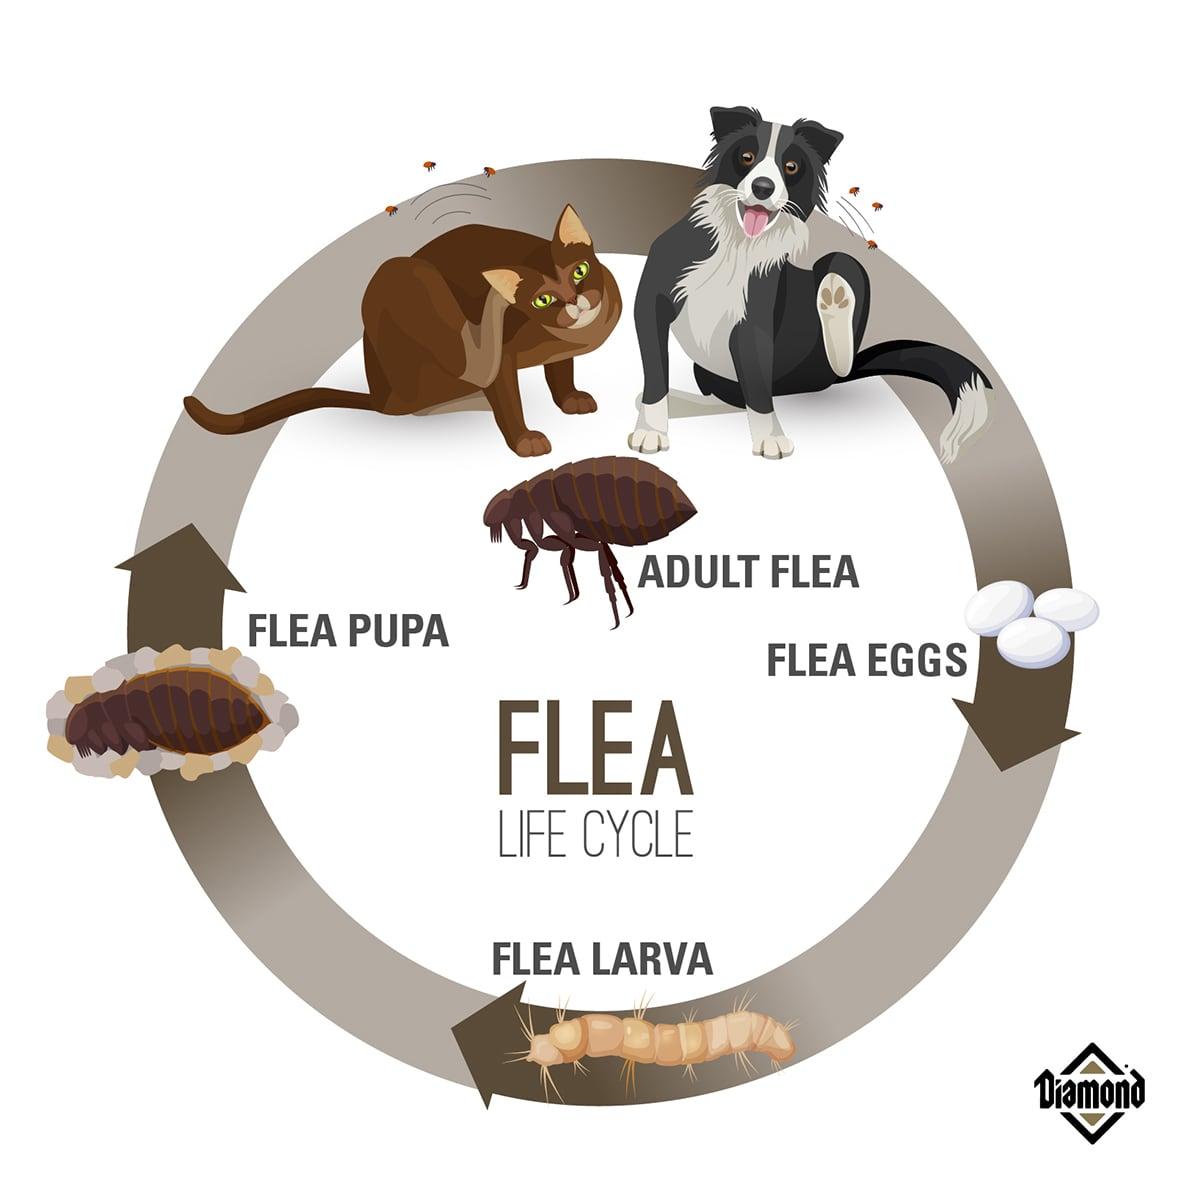 Flea Lifecycle Diagram | Diamond Pet Foods